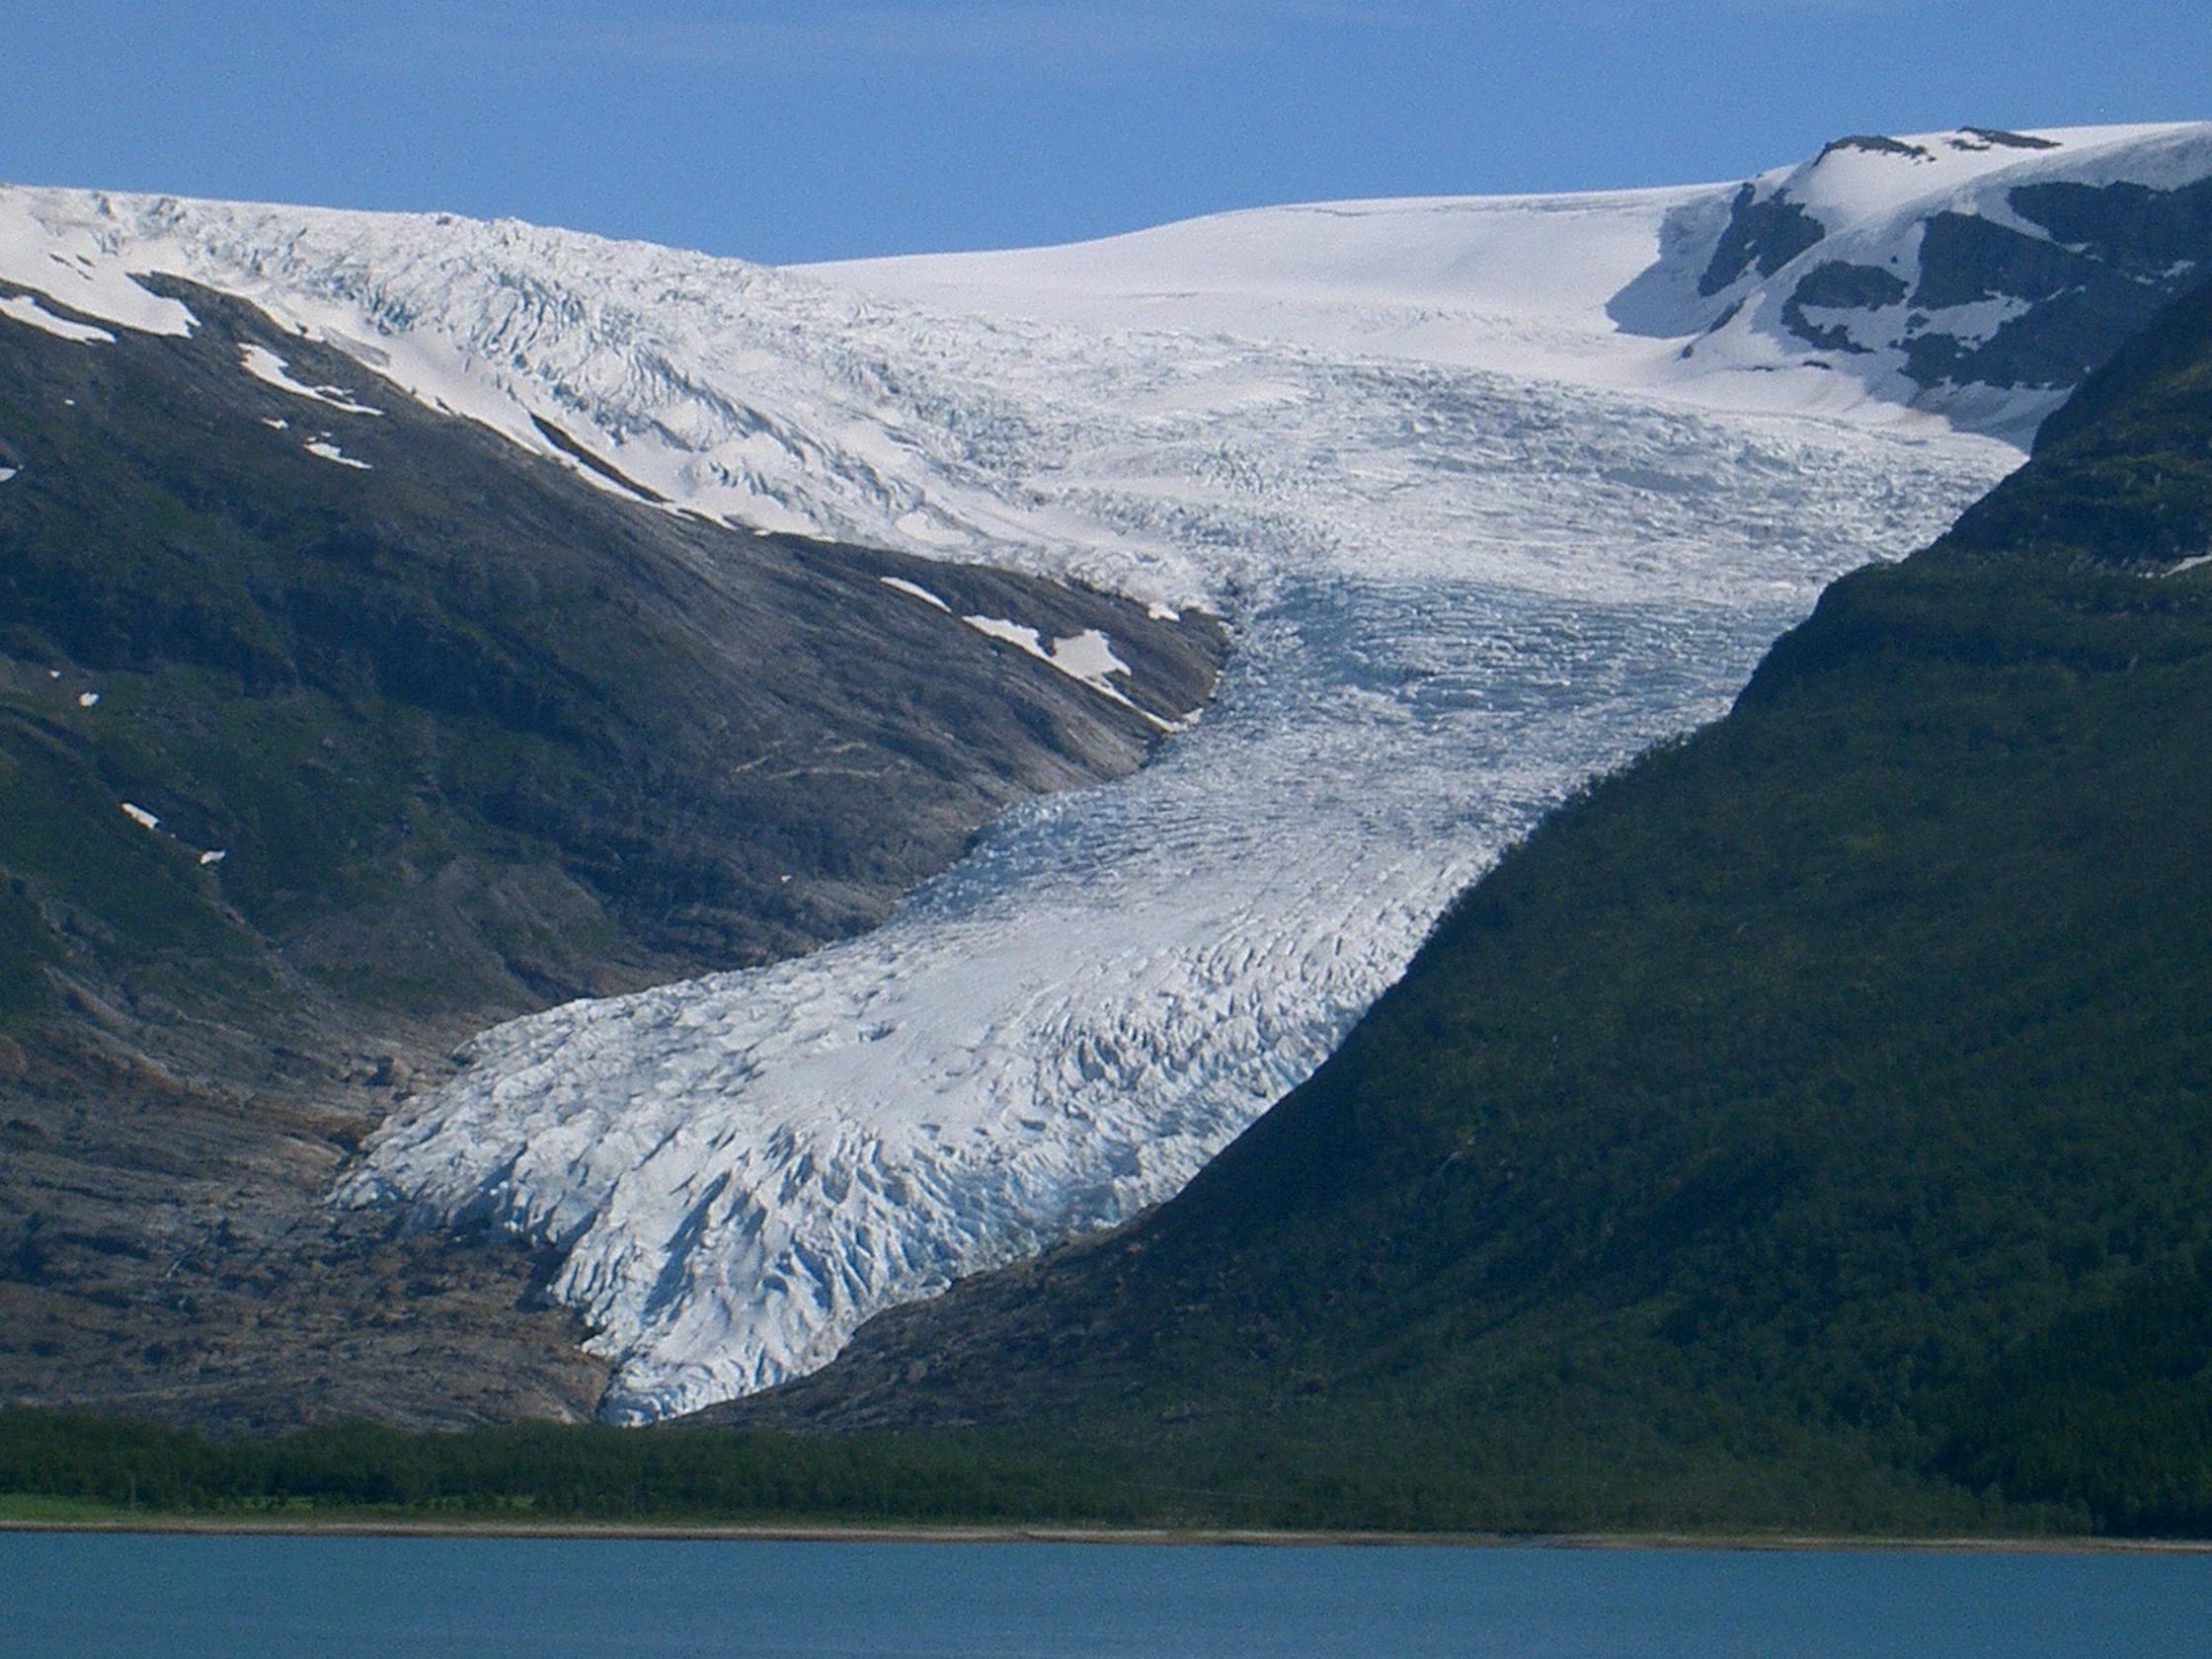 blue glacier - Northern Norway Forum - TripAdvisor